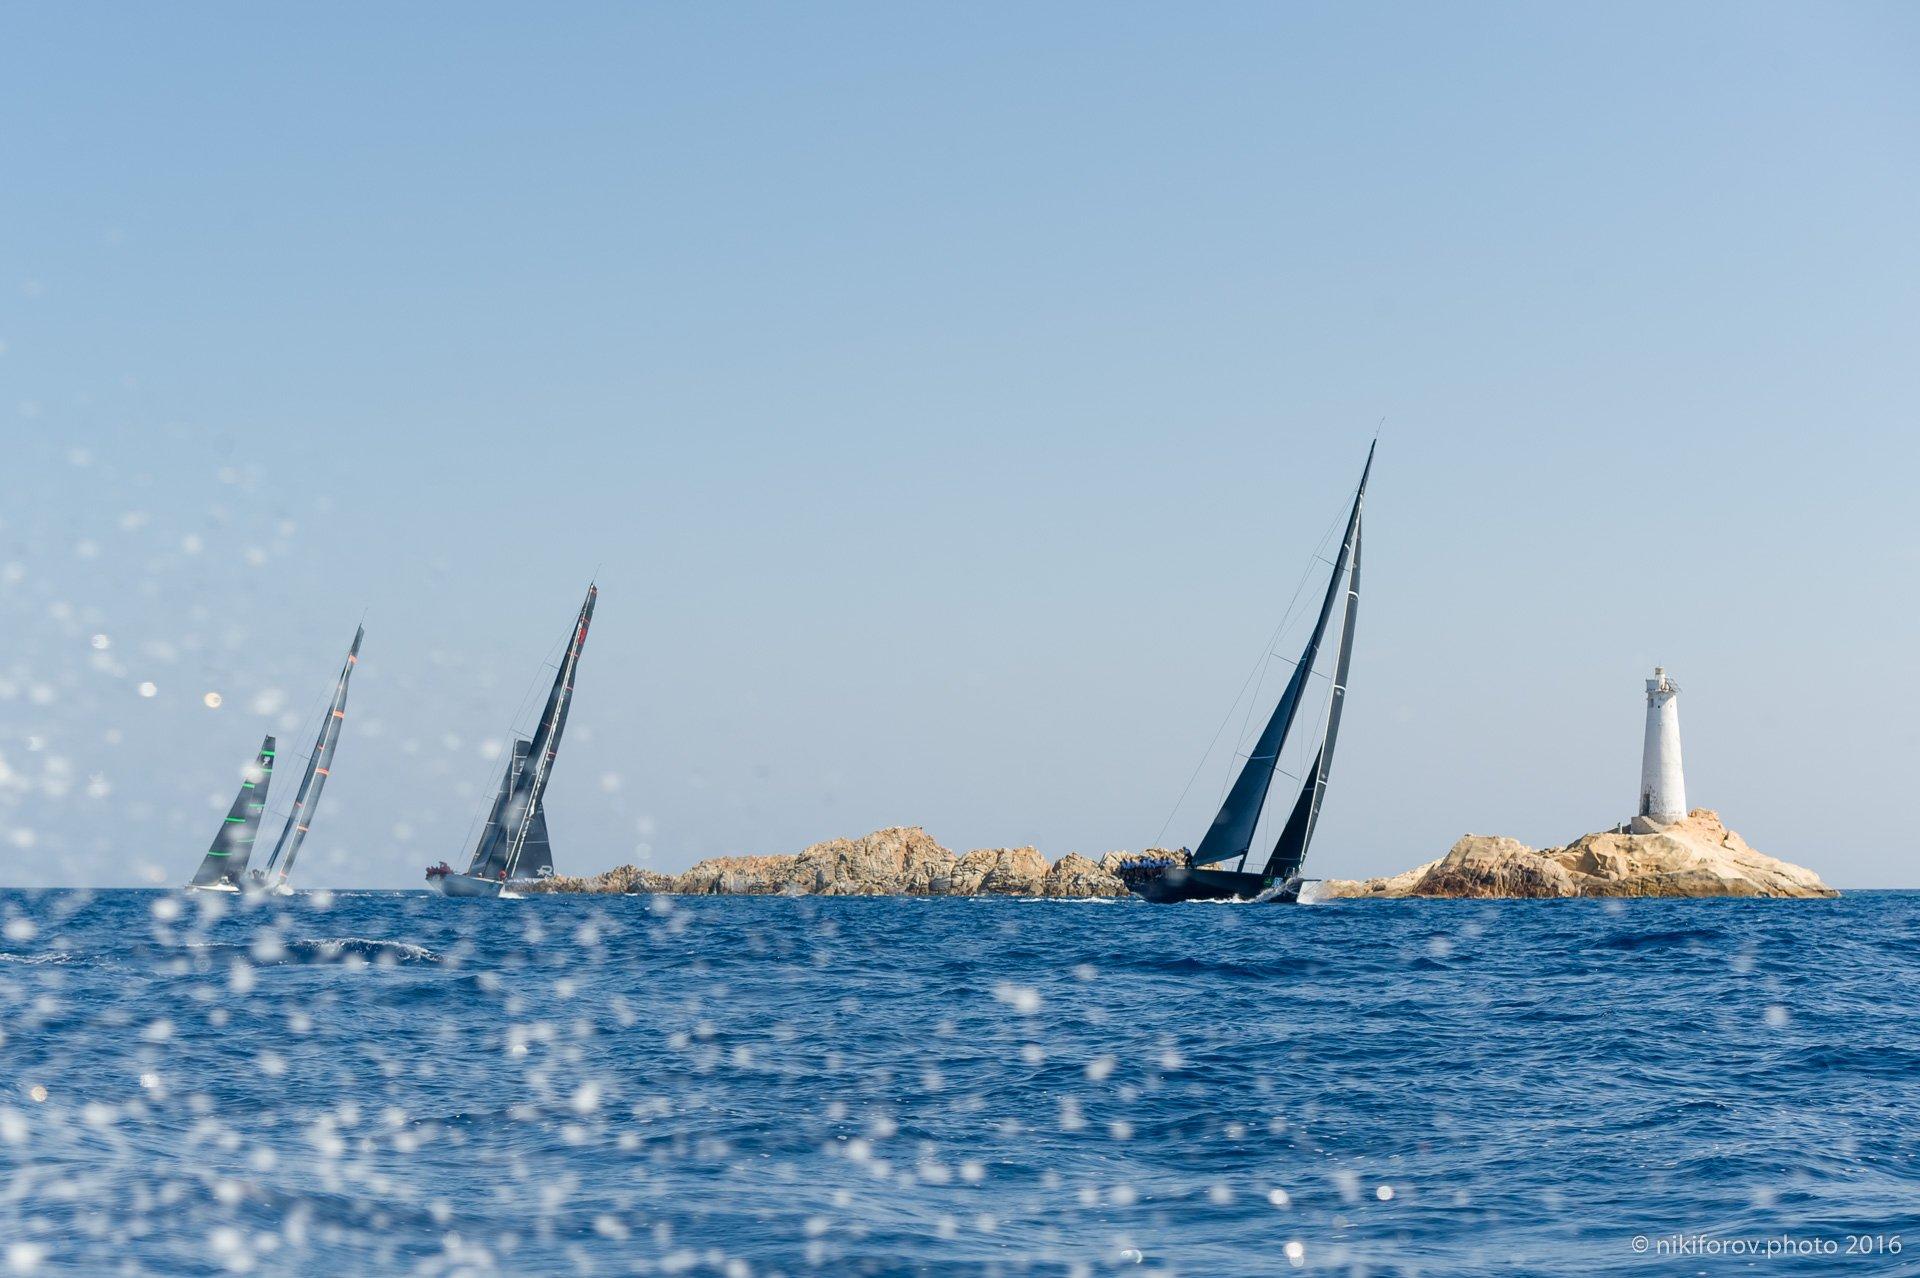 яхтинг, паруса, регата, спорт, море, rolex, regatta, regata, sailing, yachting, sail, яхта, гонка, NIKIFOROV ALEXANDER